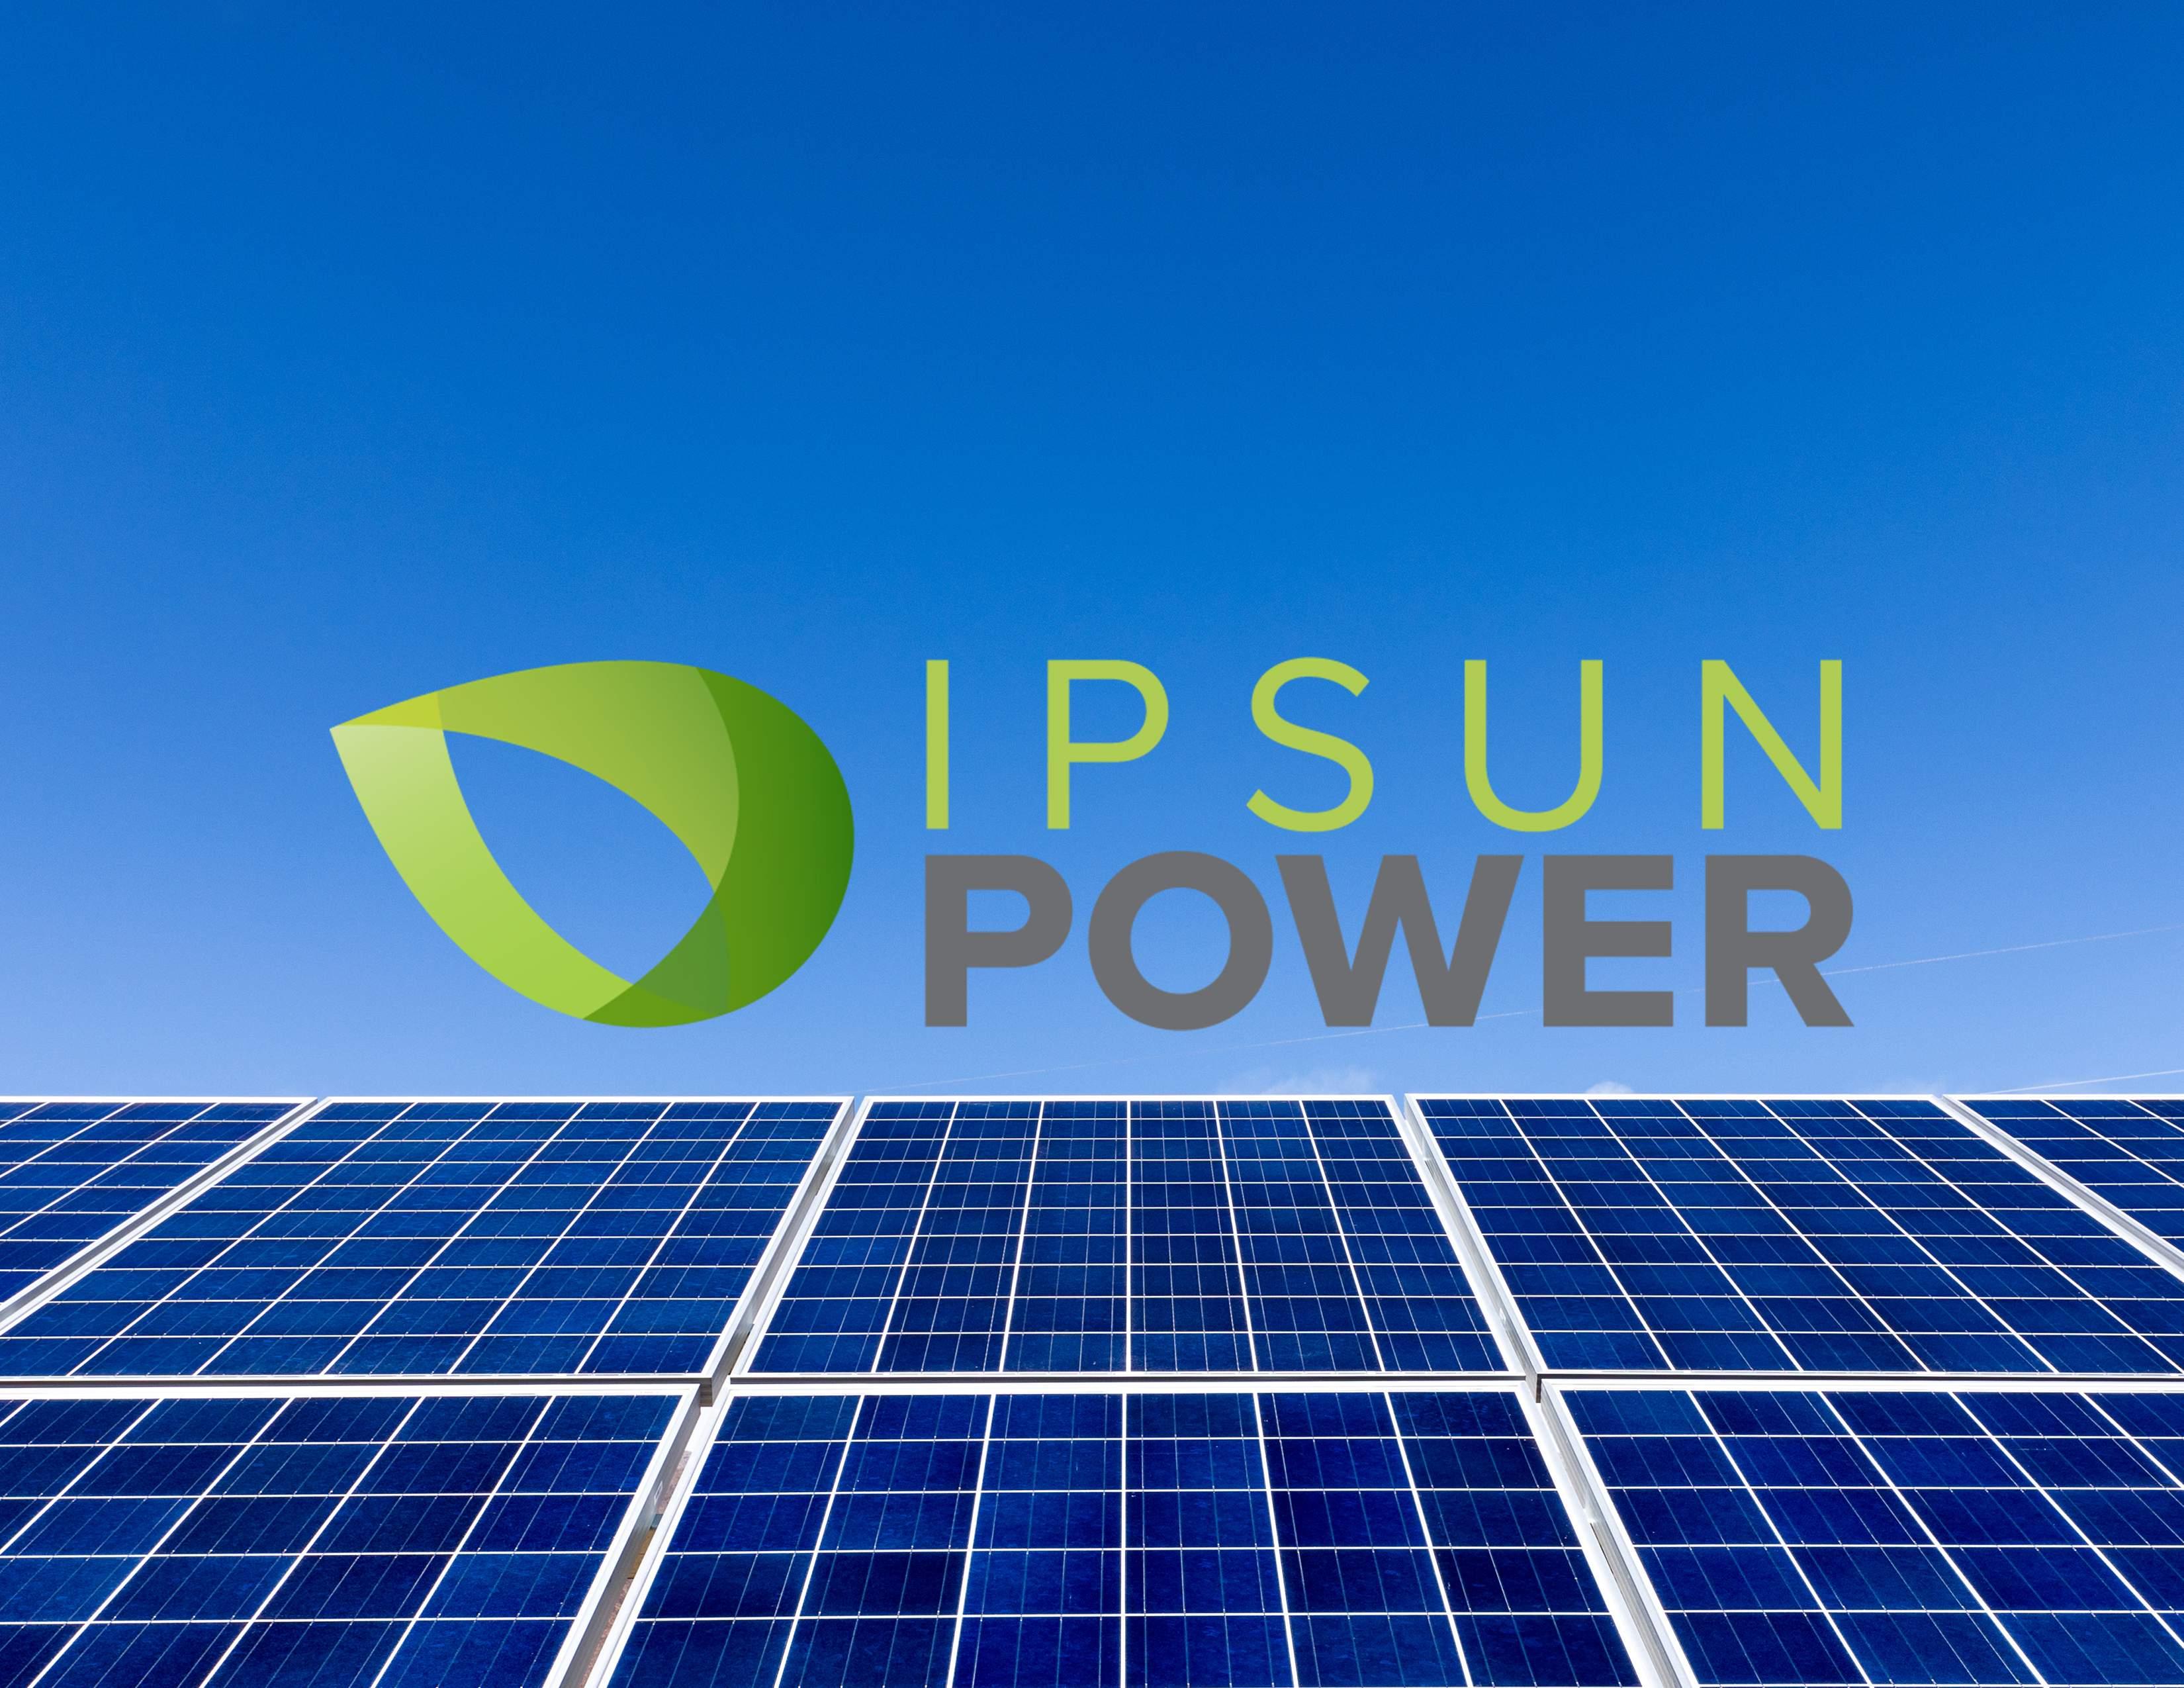 IPSUN POWER solar modules with logo